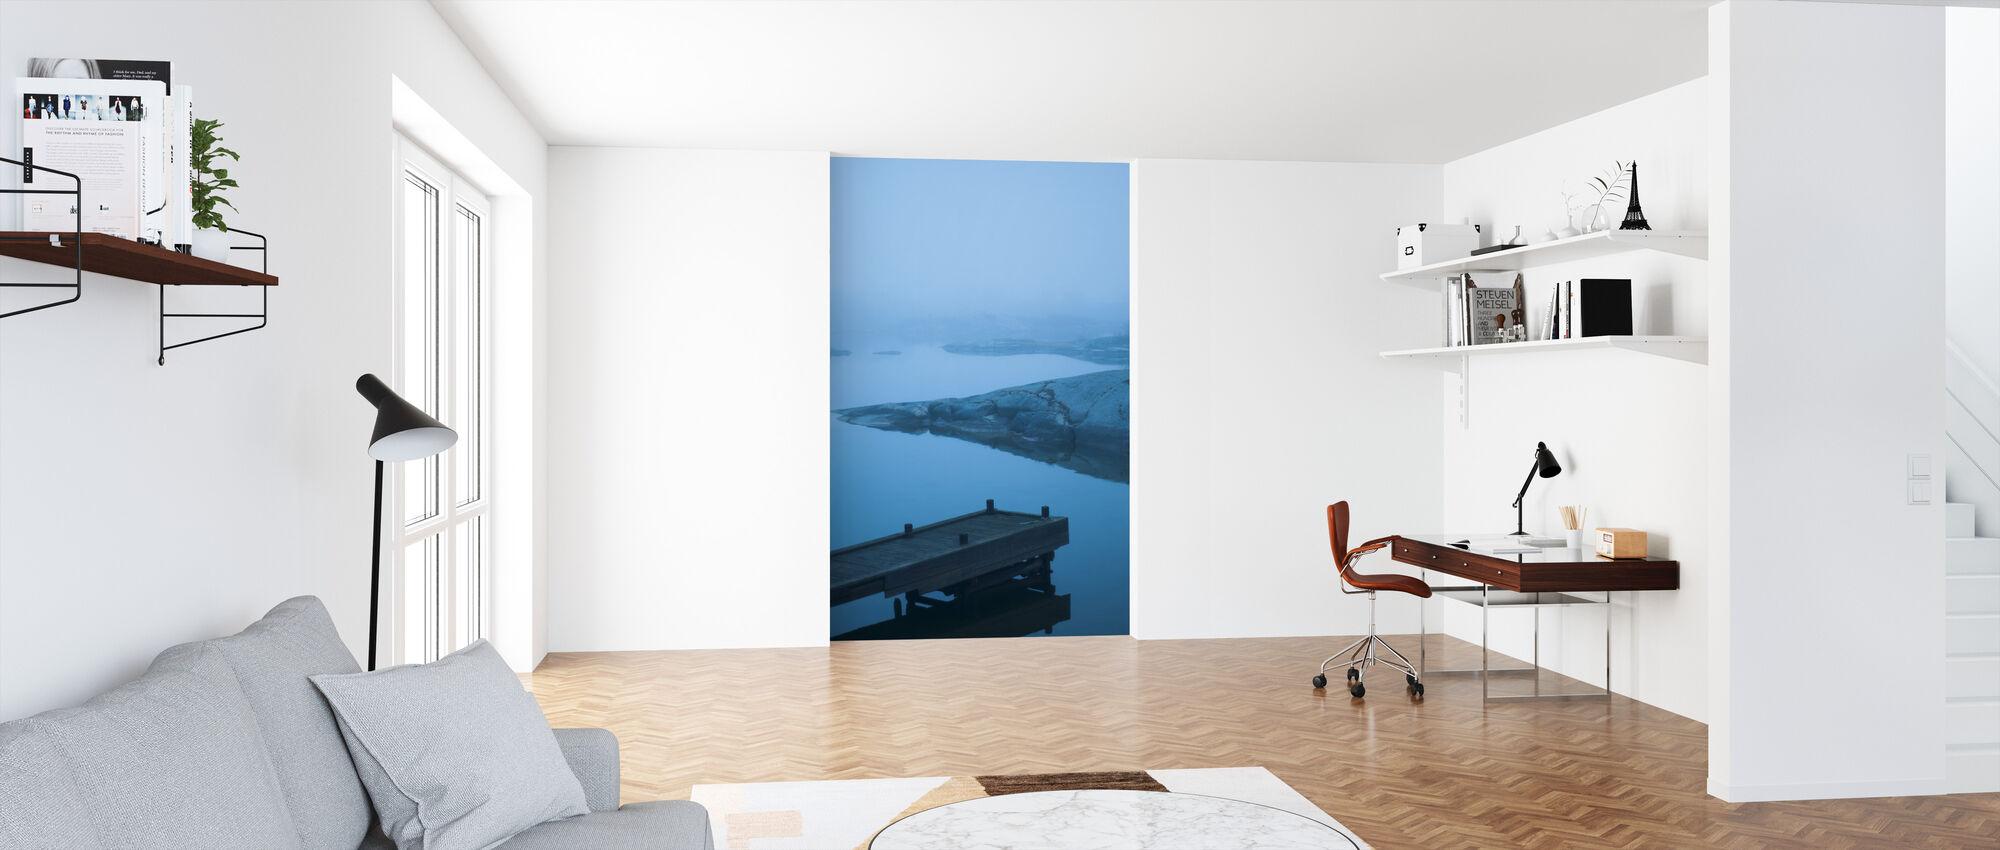 Blå strandpromenad i Uppland, Sverige, Europa - Tapet - Kontor